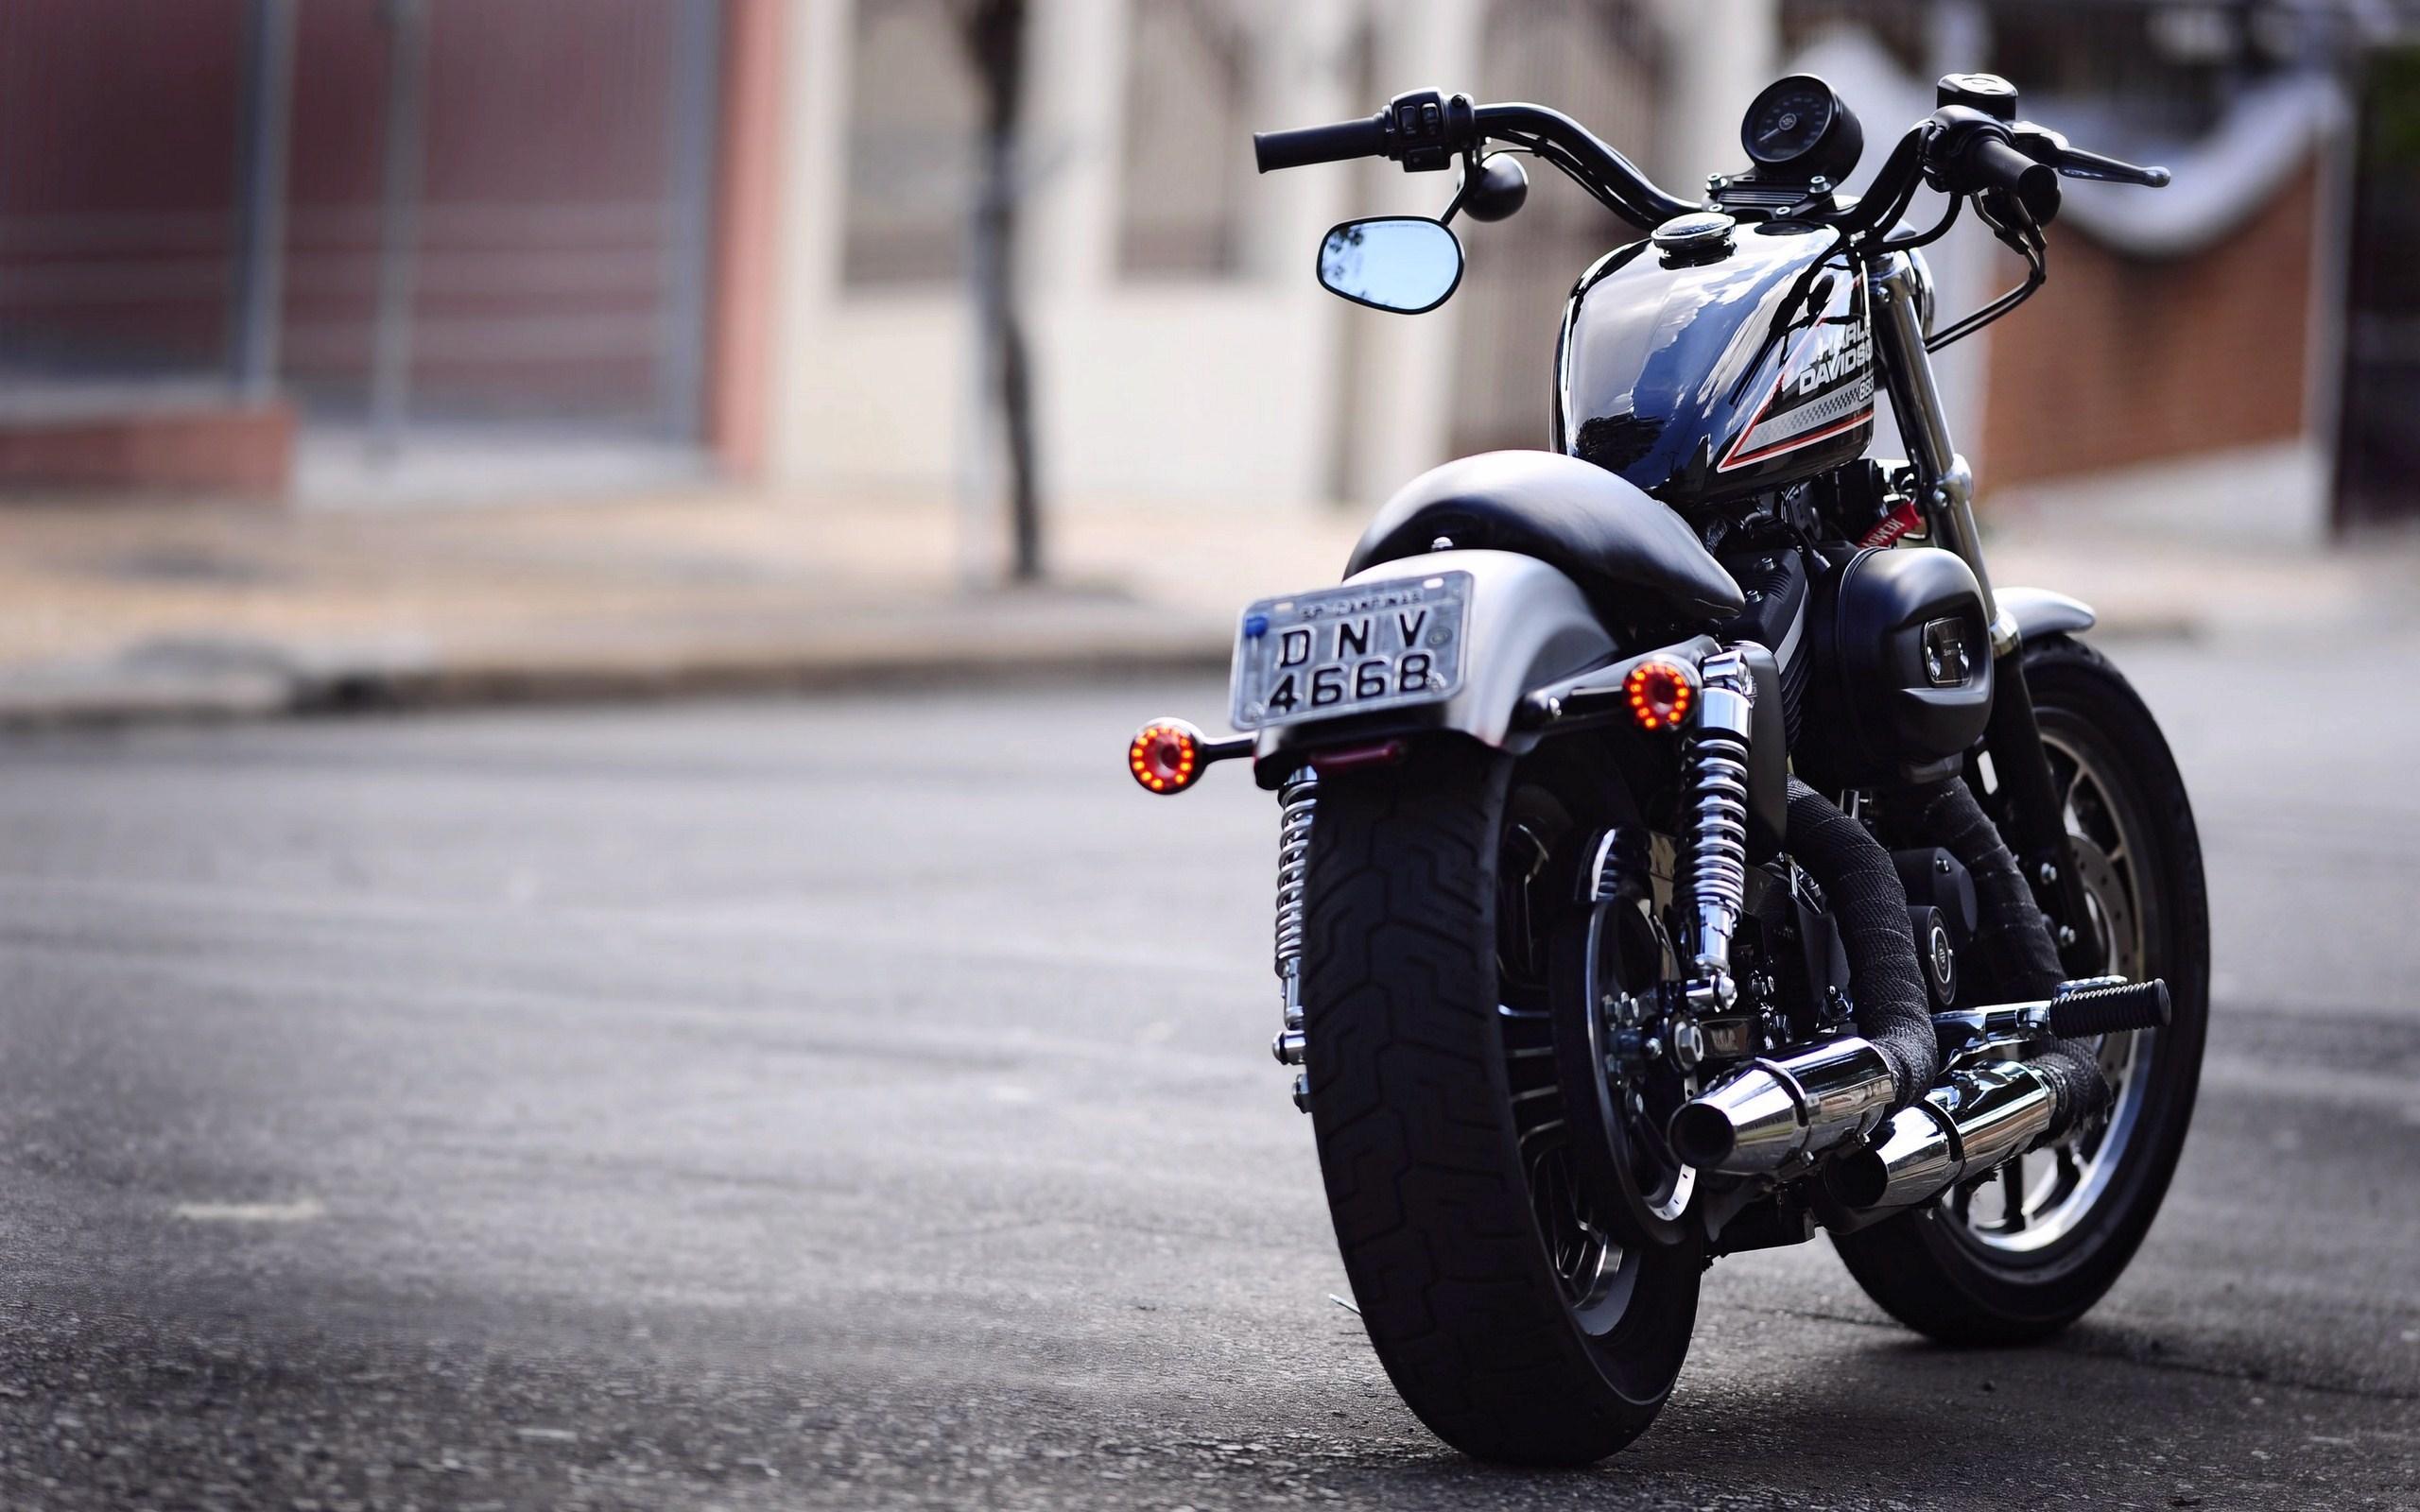 HD Wallpapers Motorcycle Harley Davidson 883 HD Wallpaper 2560x1600